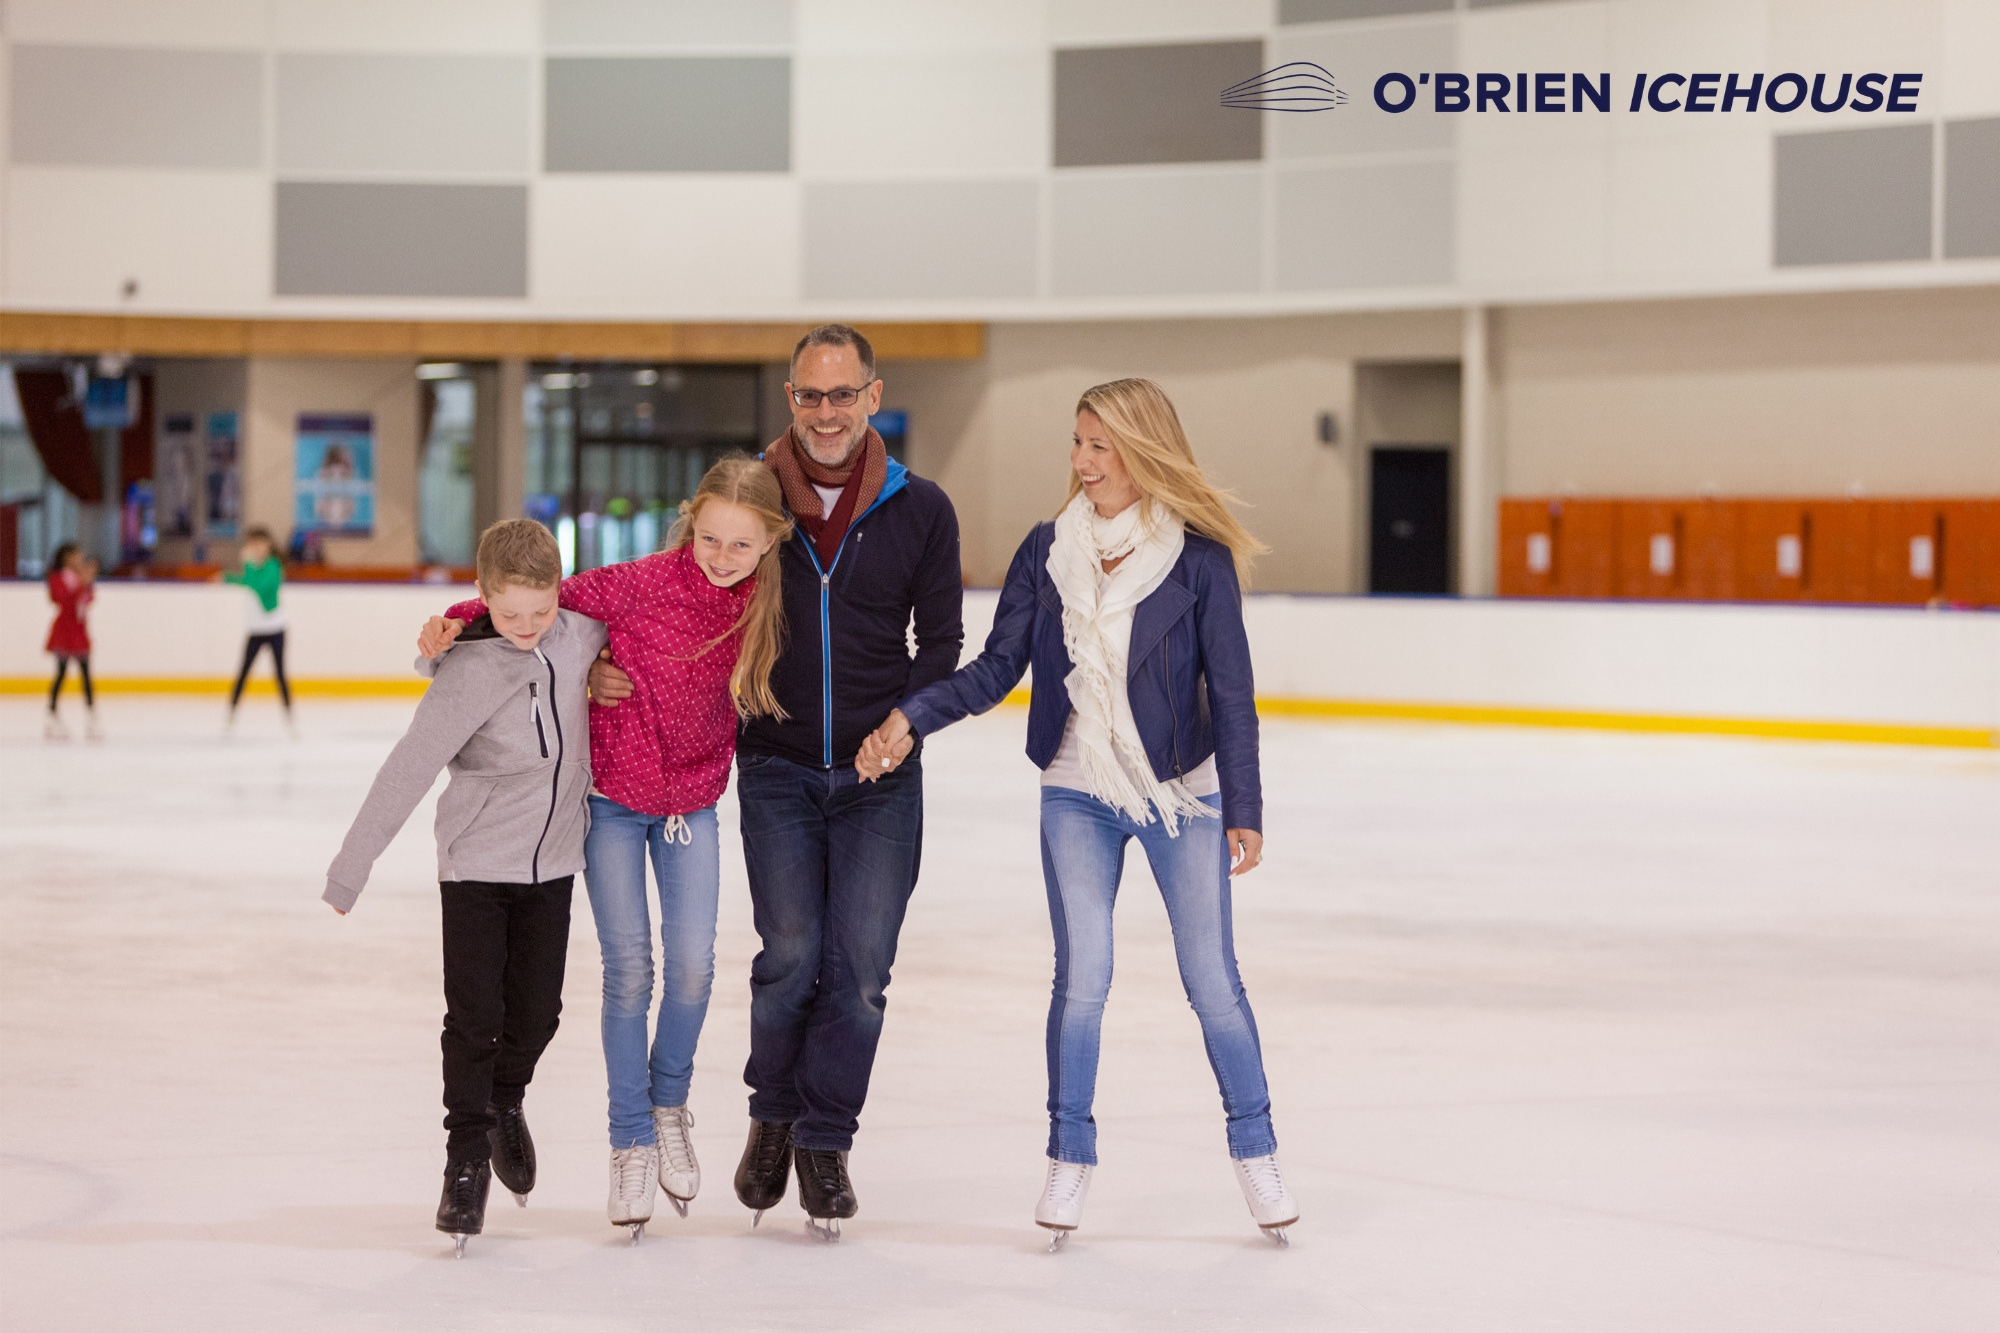 O'Brien Icehouse discount